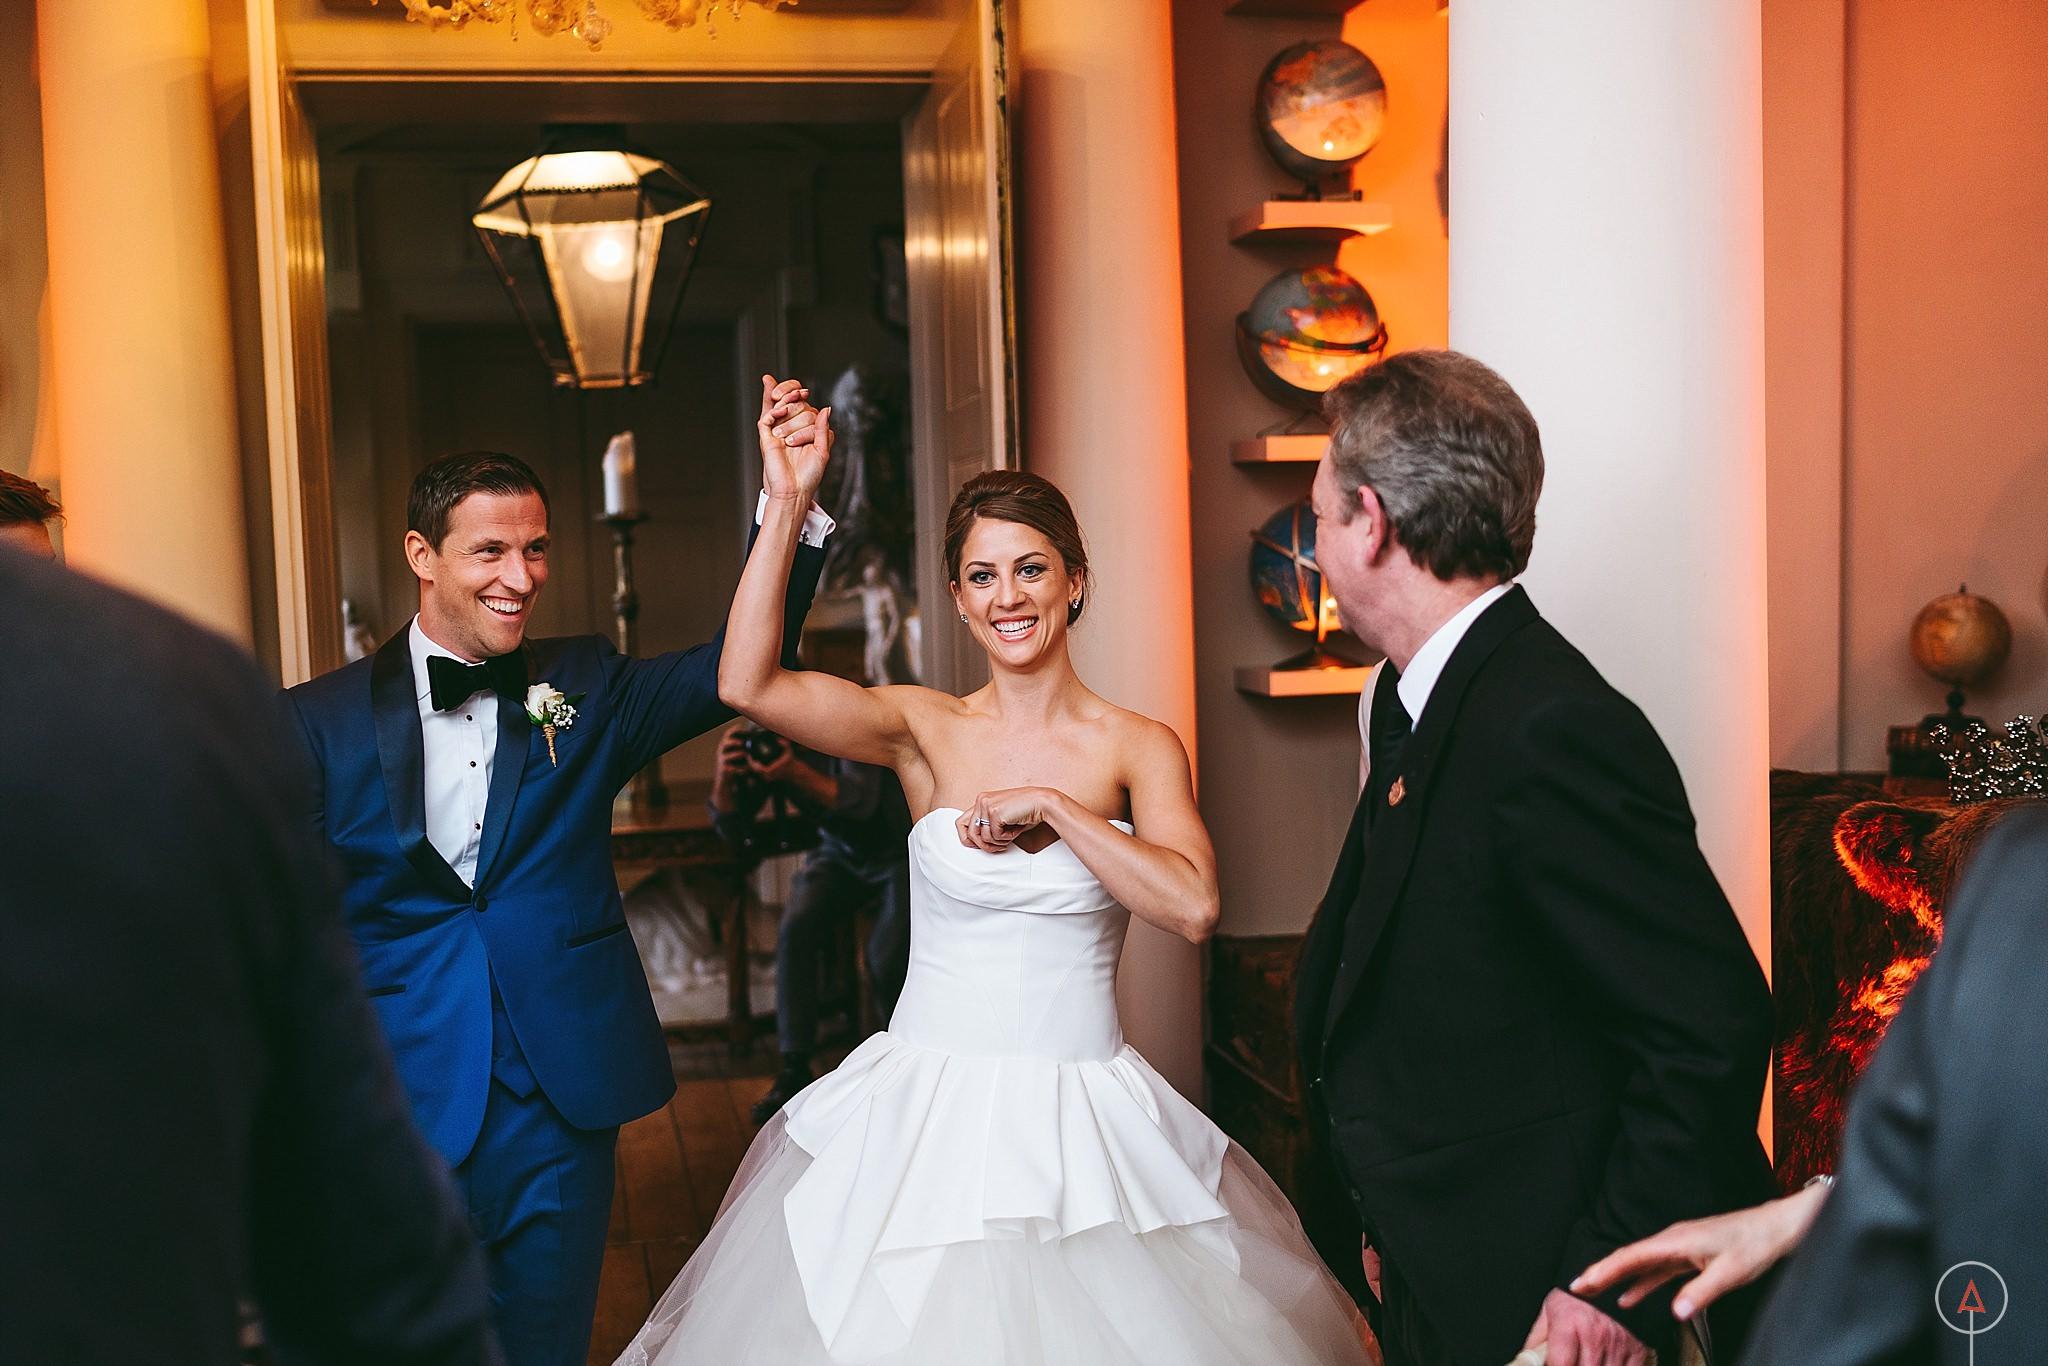 cardiff-wedding-photographer-aga-tomaszek_0302